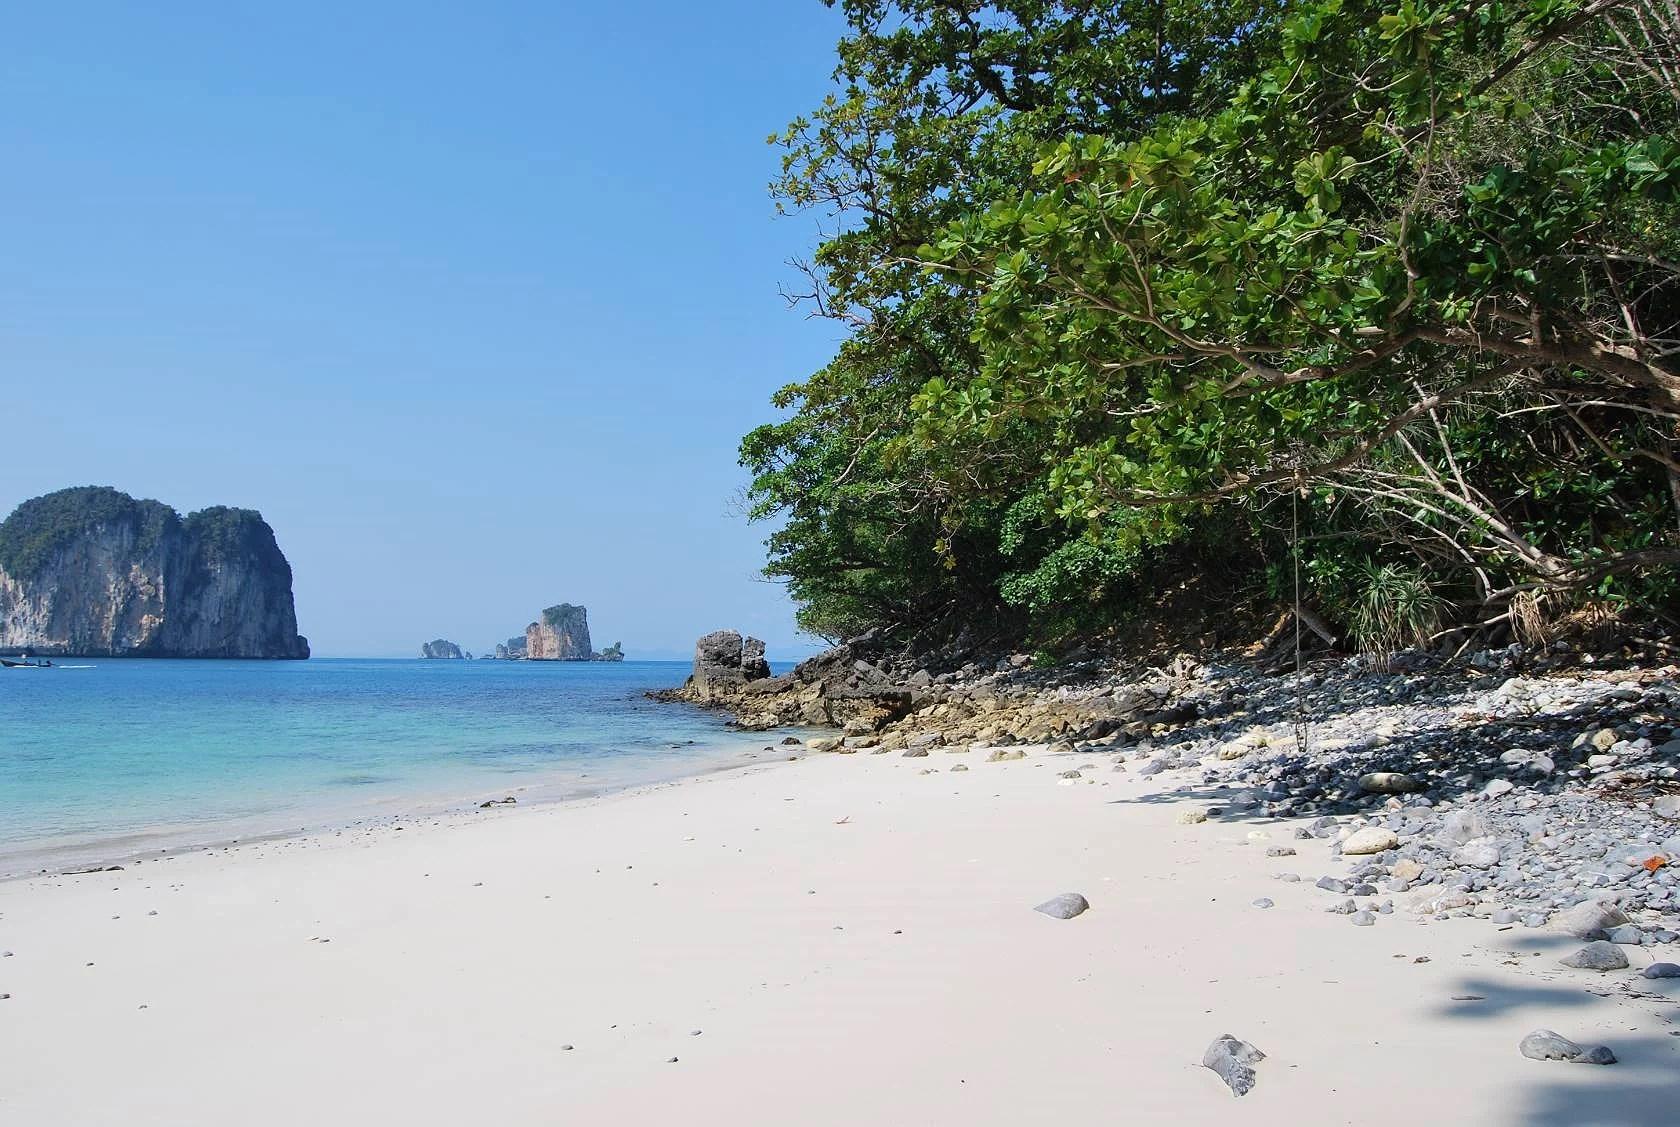 THAILAND - SOON